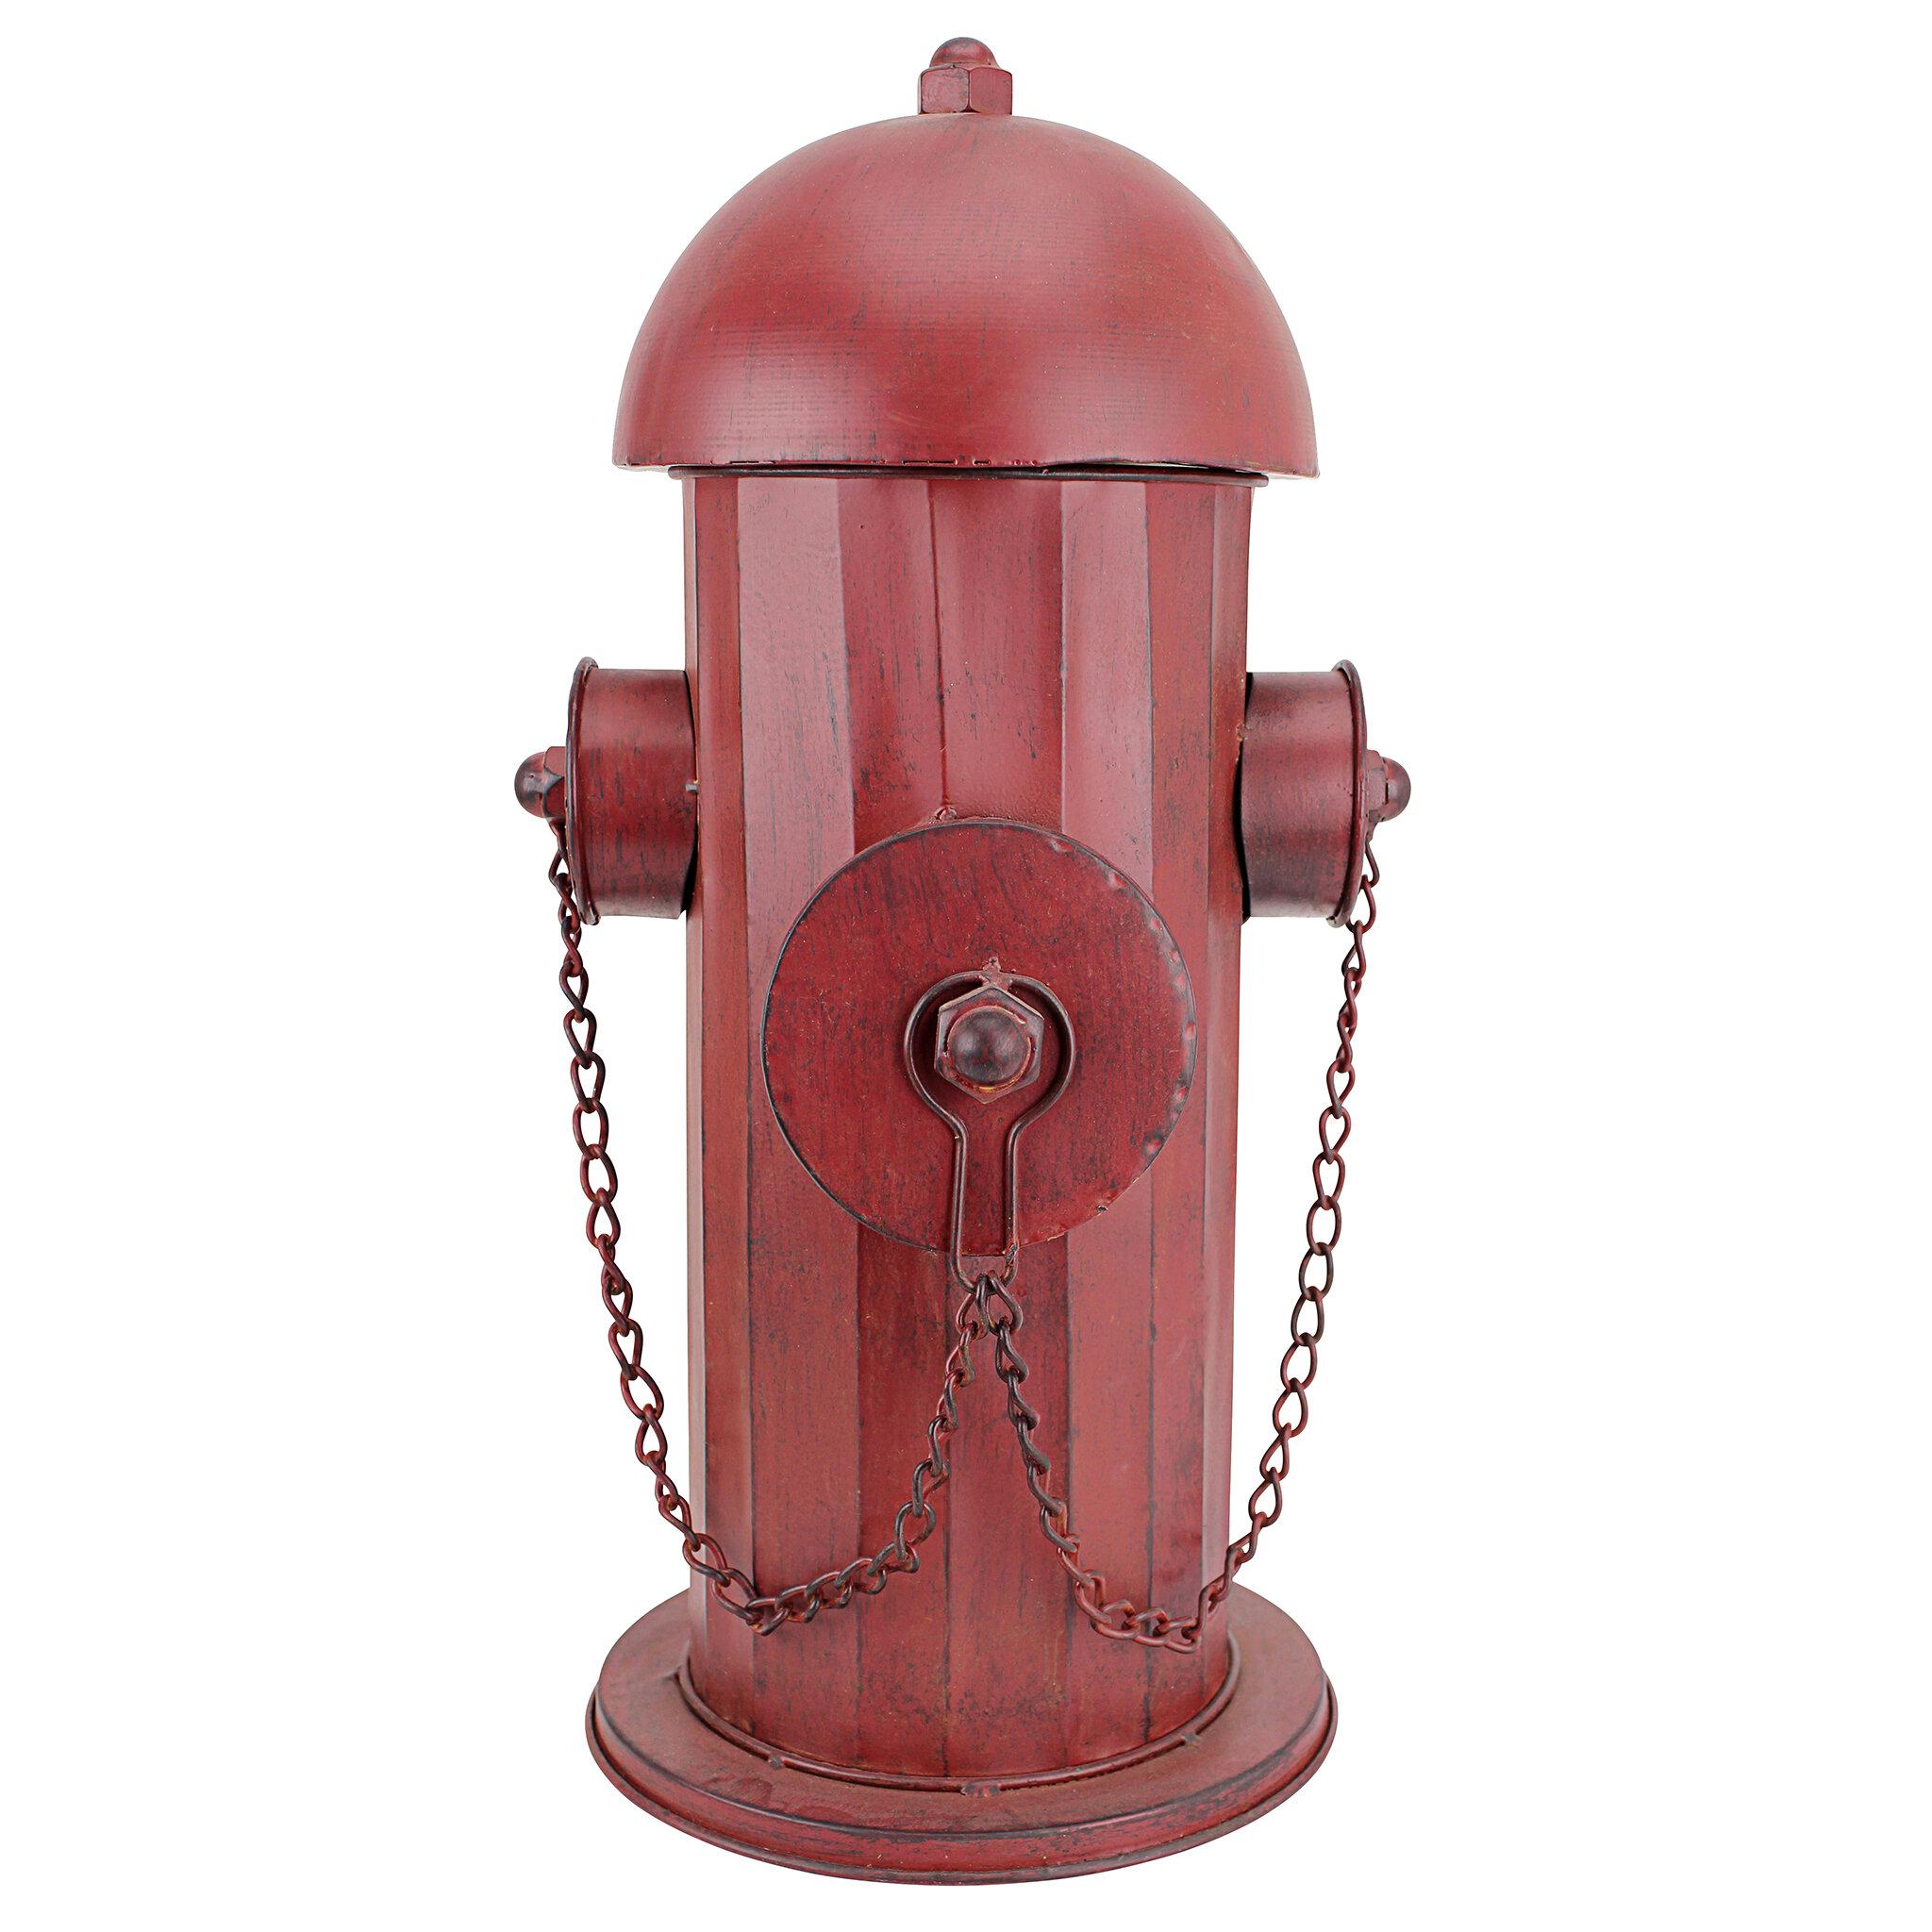 design toscano medium metal fire hydrant statue reviews wayfair